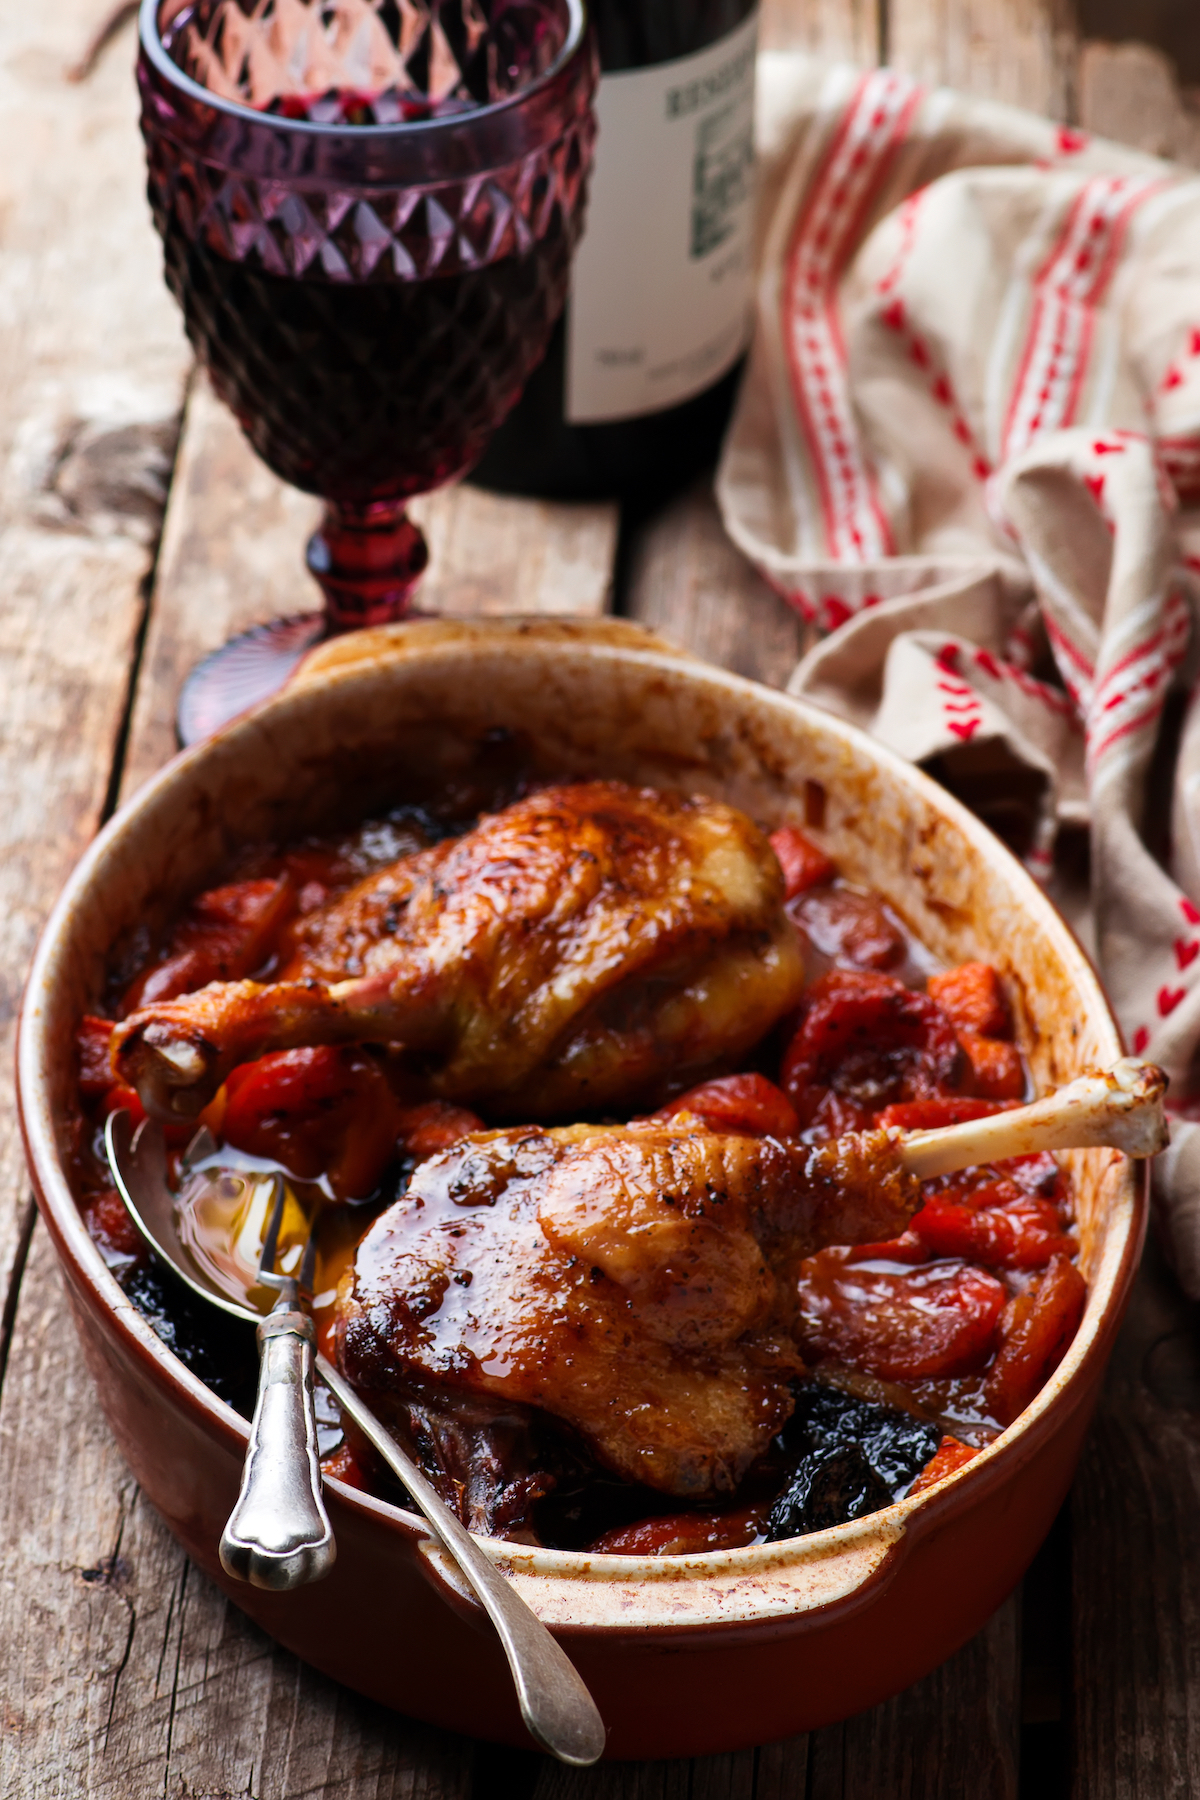 Canard aux pruneaux ©De zoryanchik shutterstock